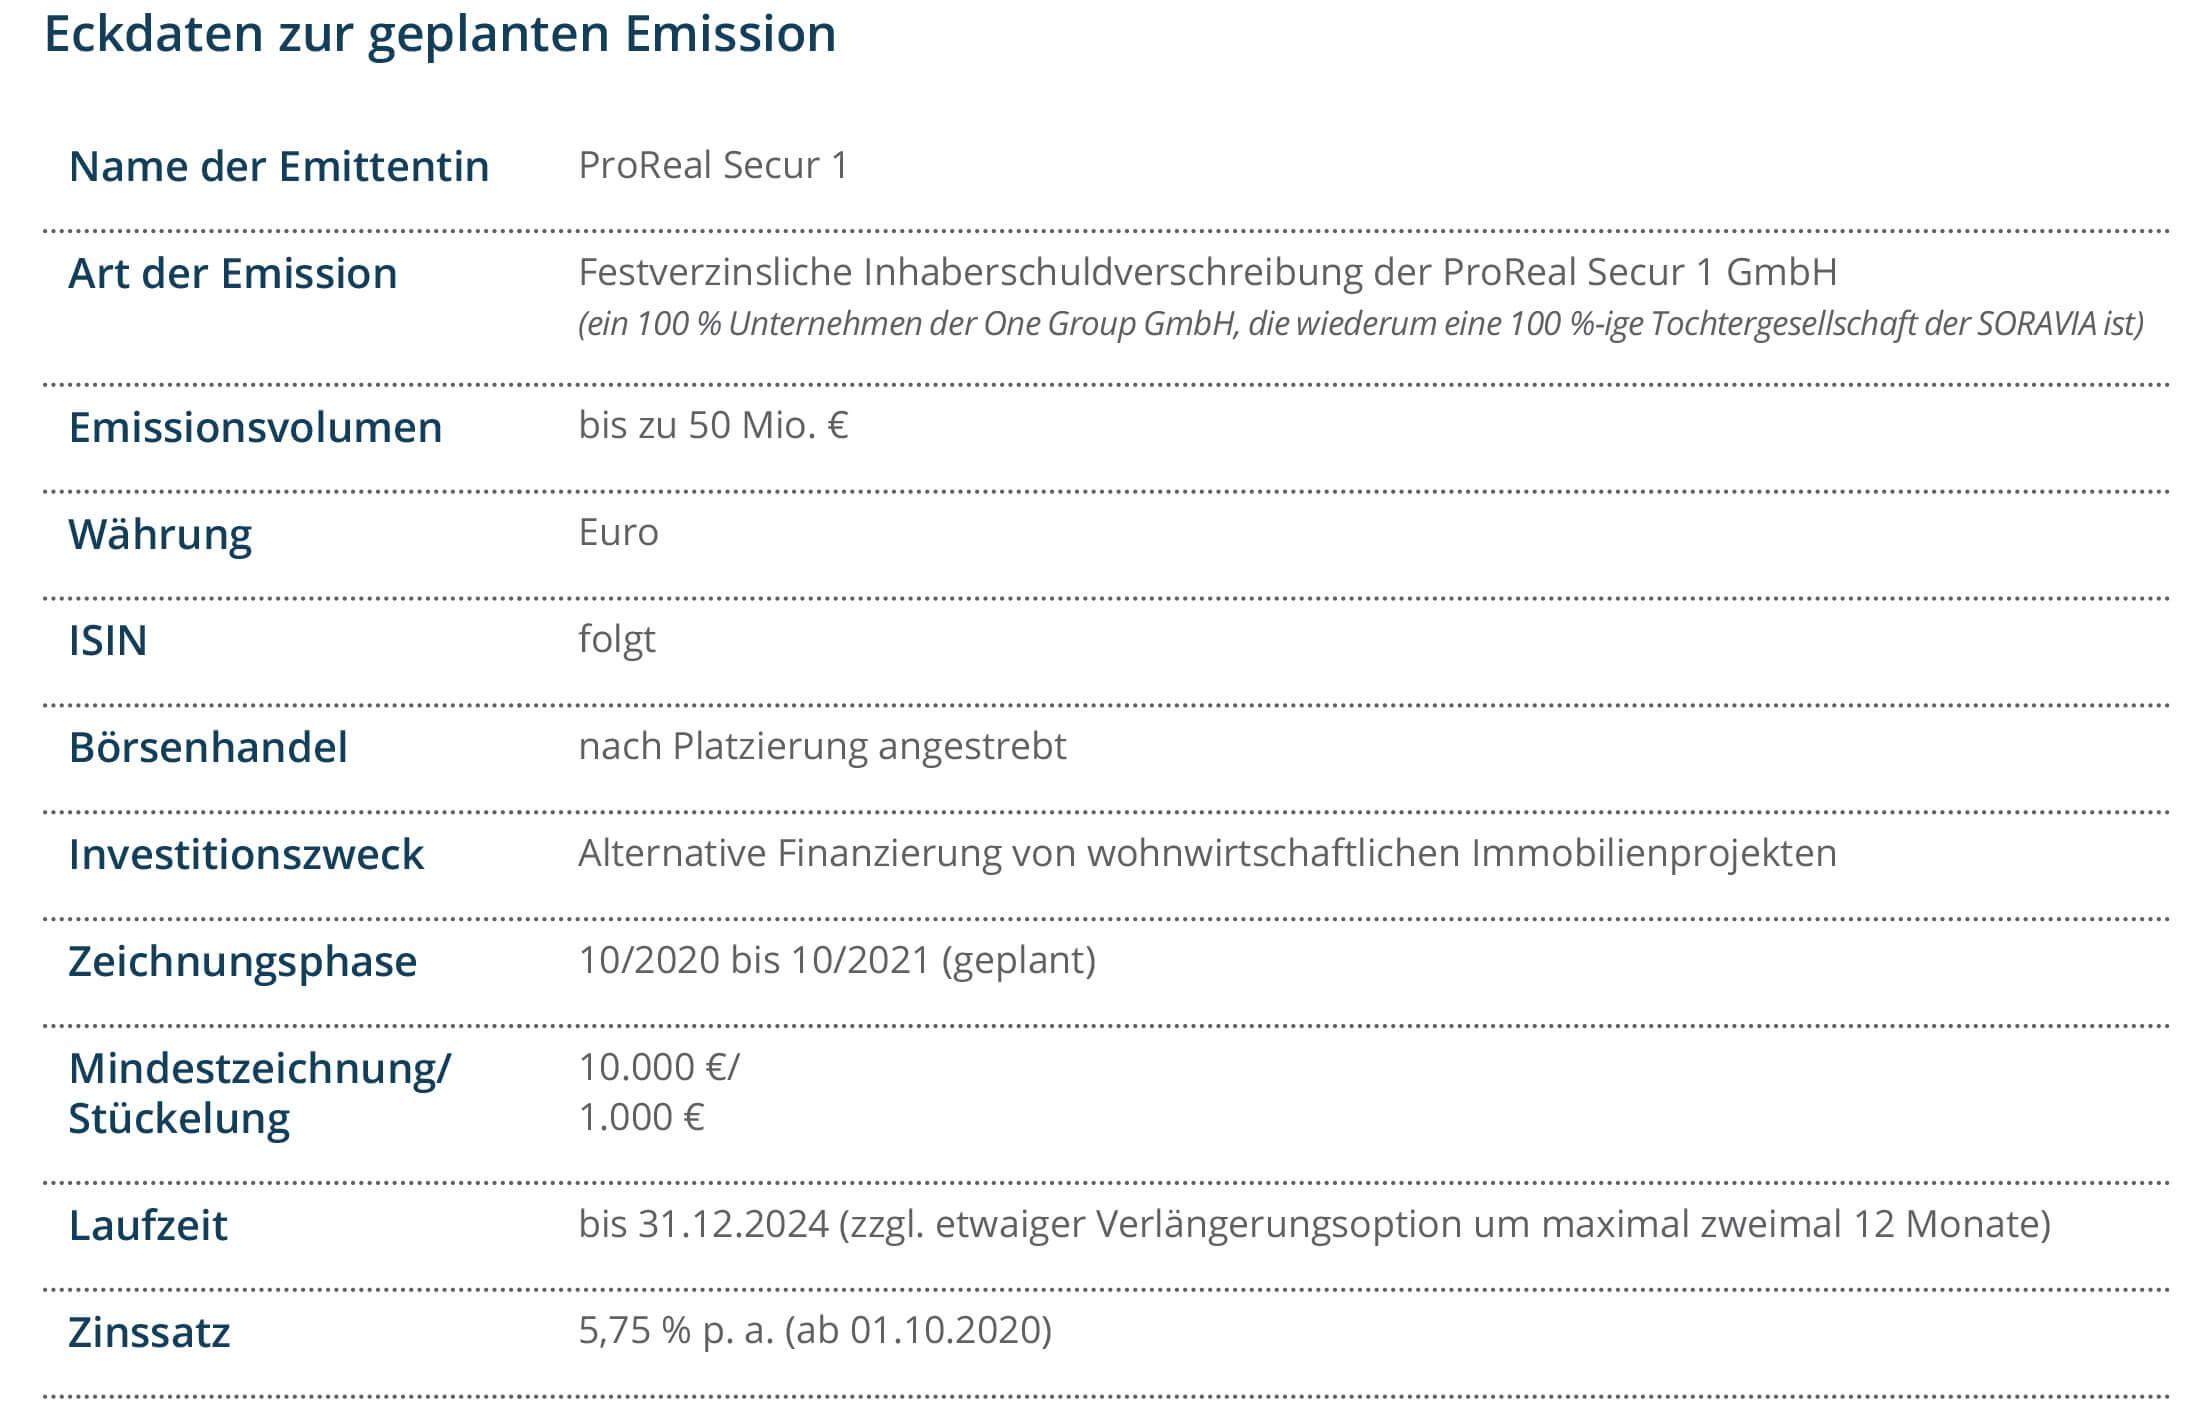 ProRealSecur_Faktenblatt-Emissions-Eckdaten